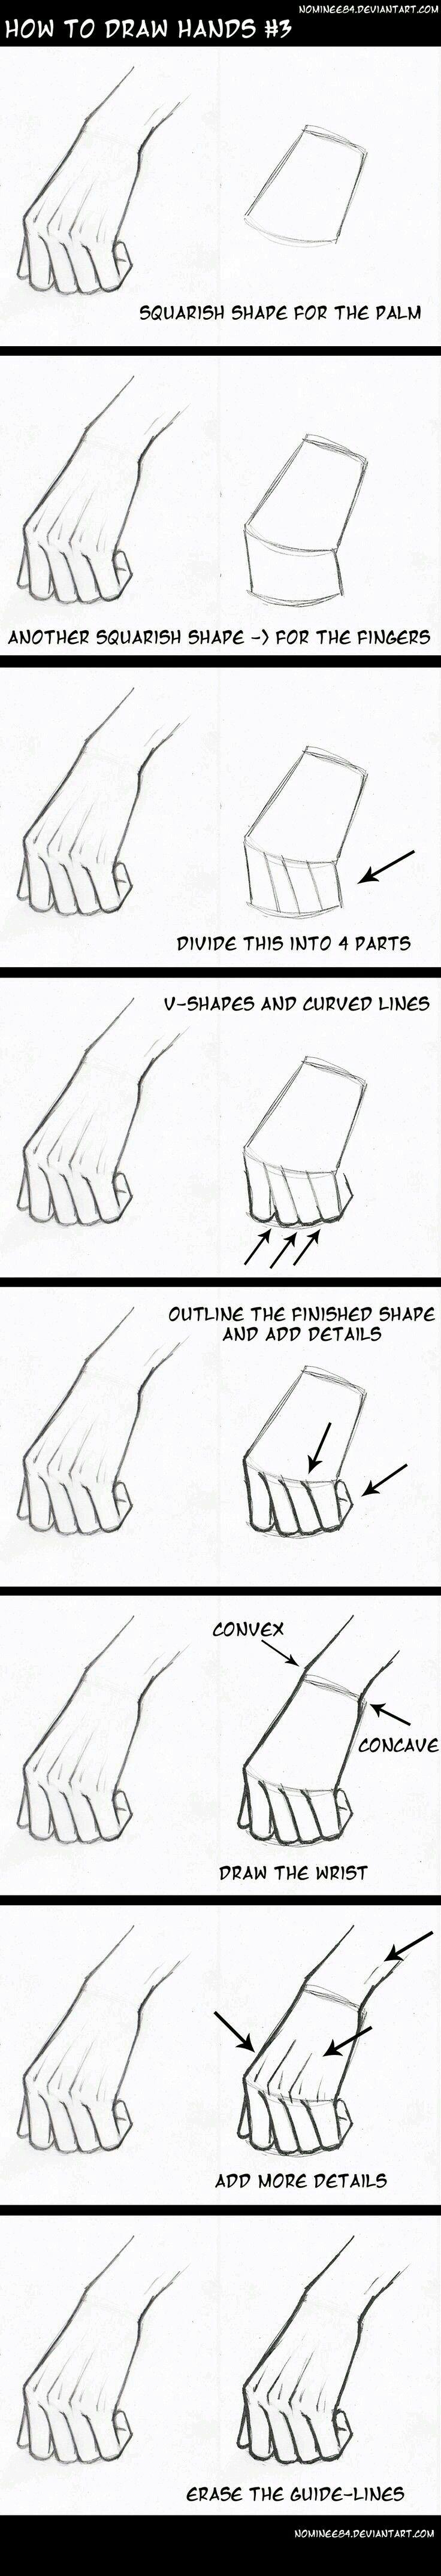 Pin by Ukkadapu Mounika on art Drawing tutorials for